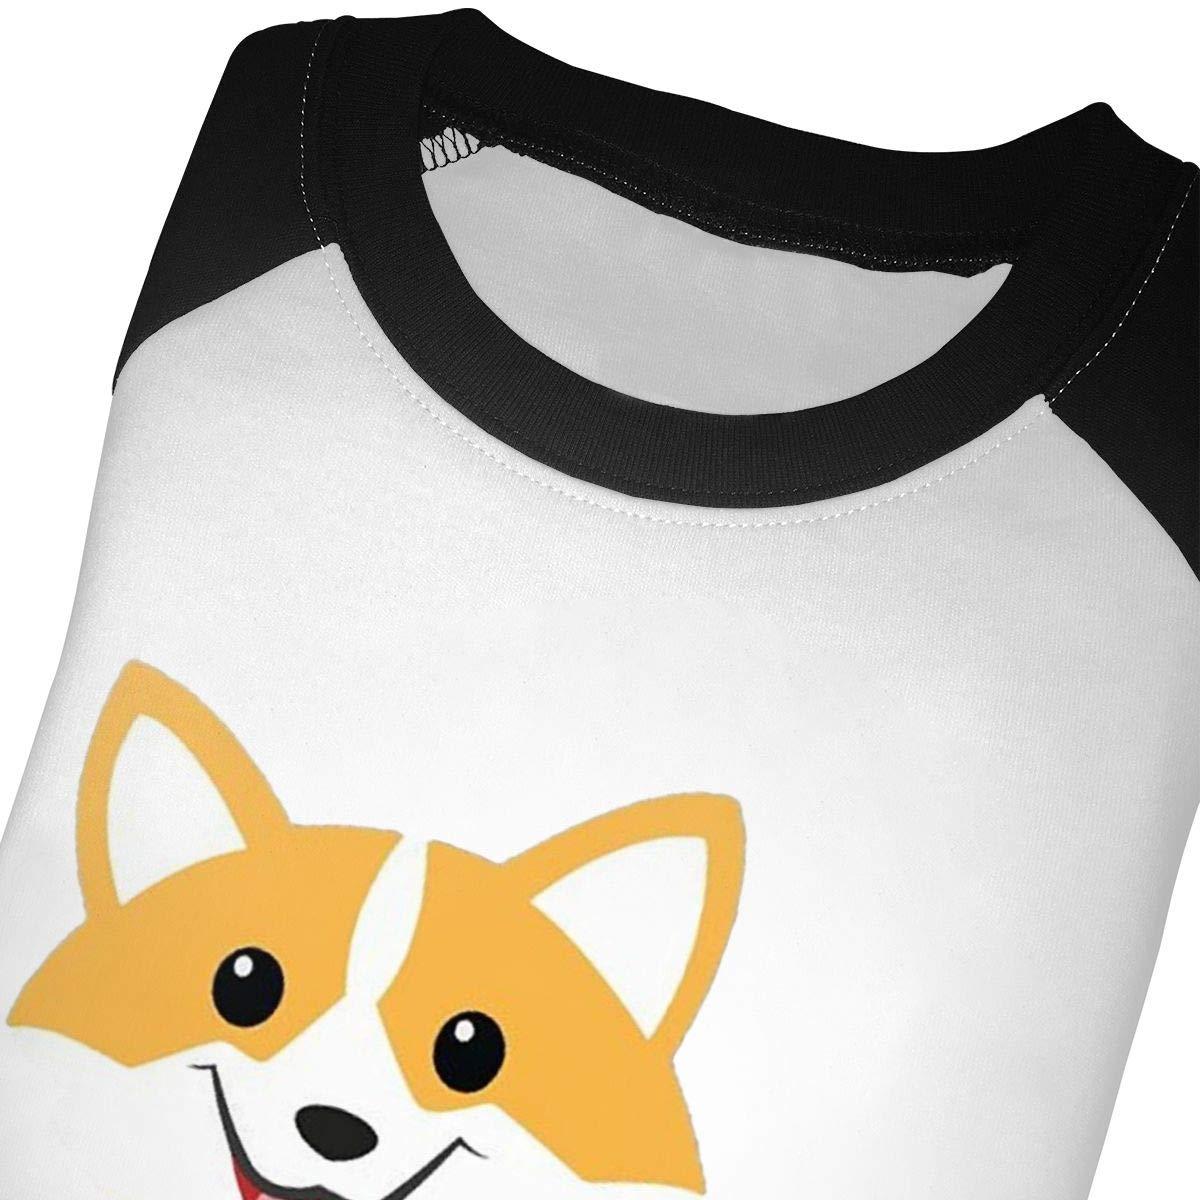 Corgi Dog Coffee Paw Teacups Unisex Toddler Baseball Jersey Contrast 3//4 Sleeves Tee